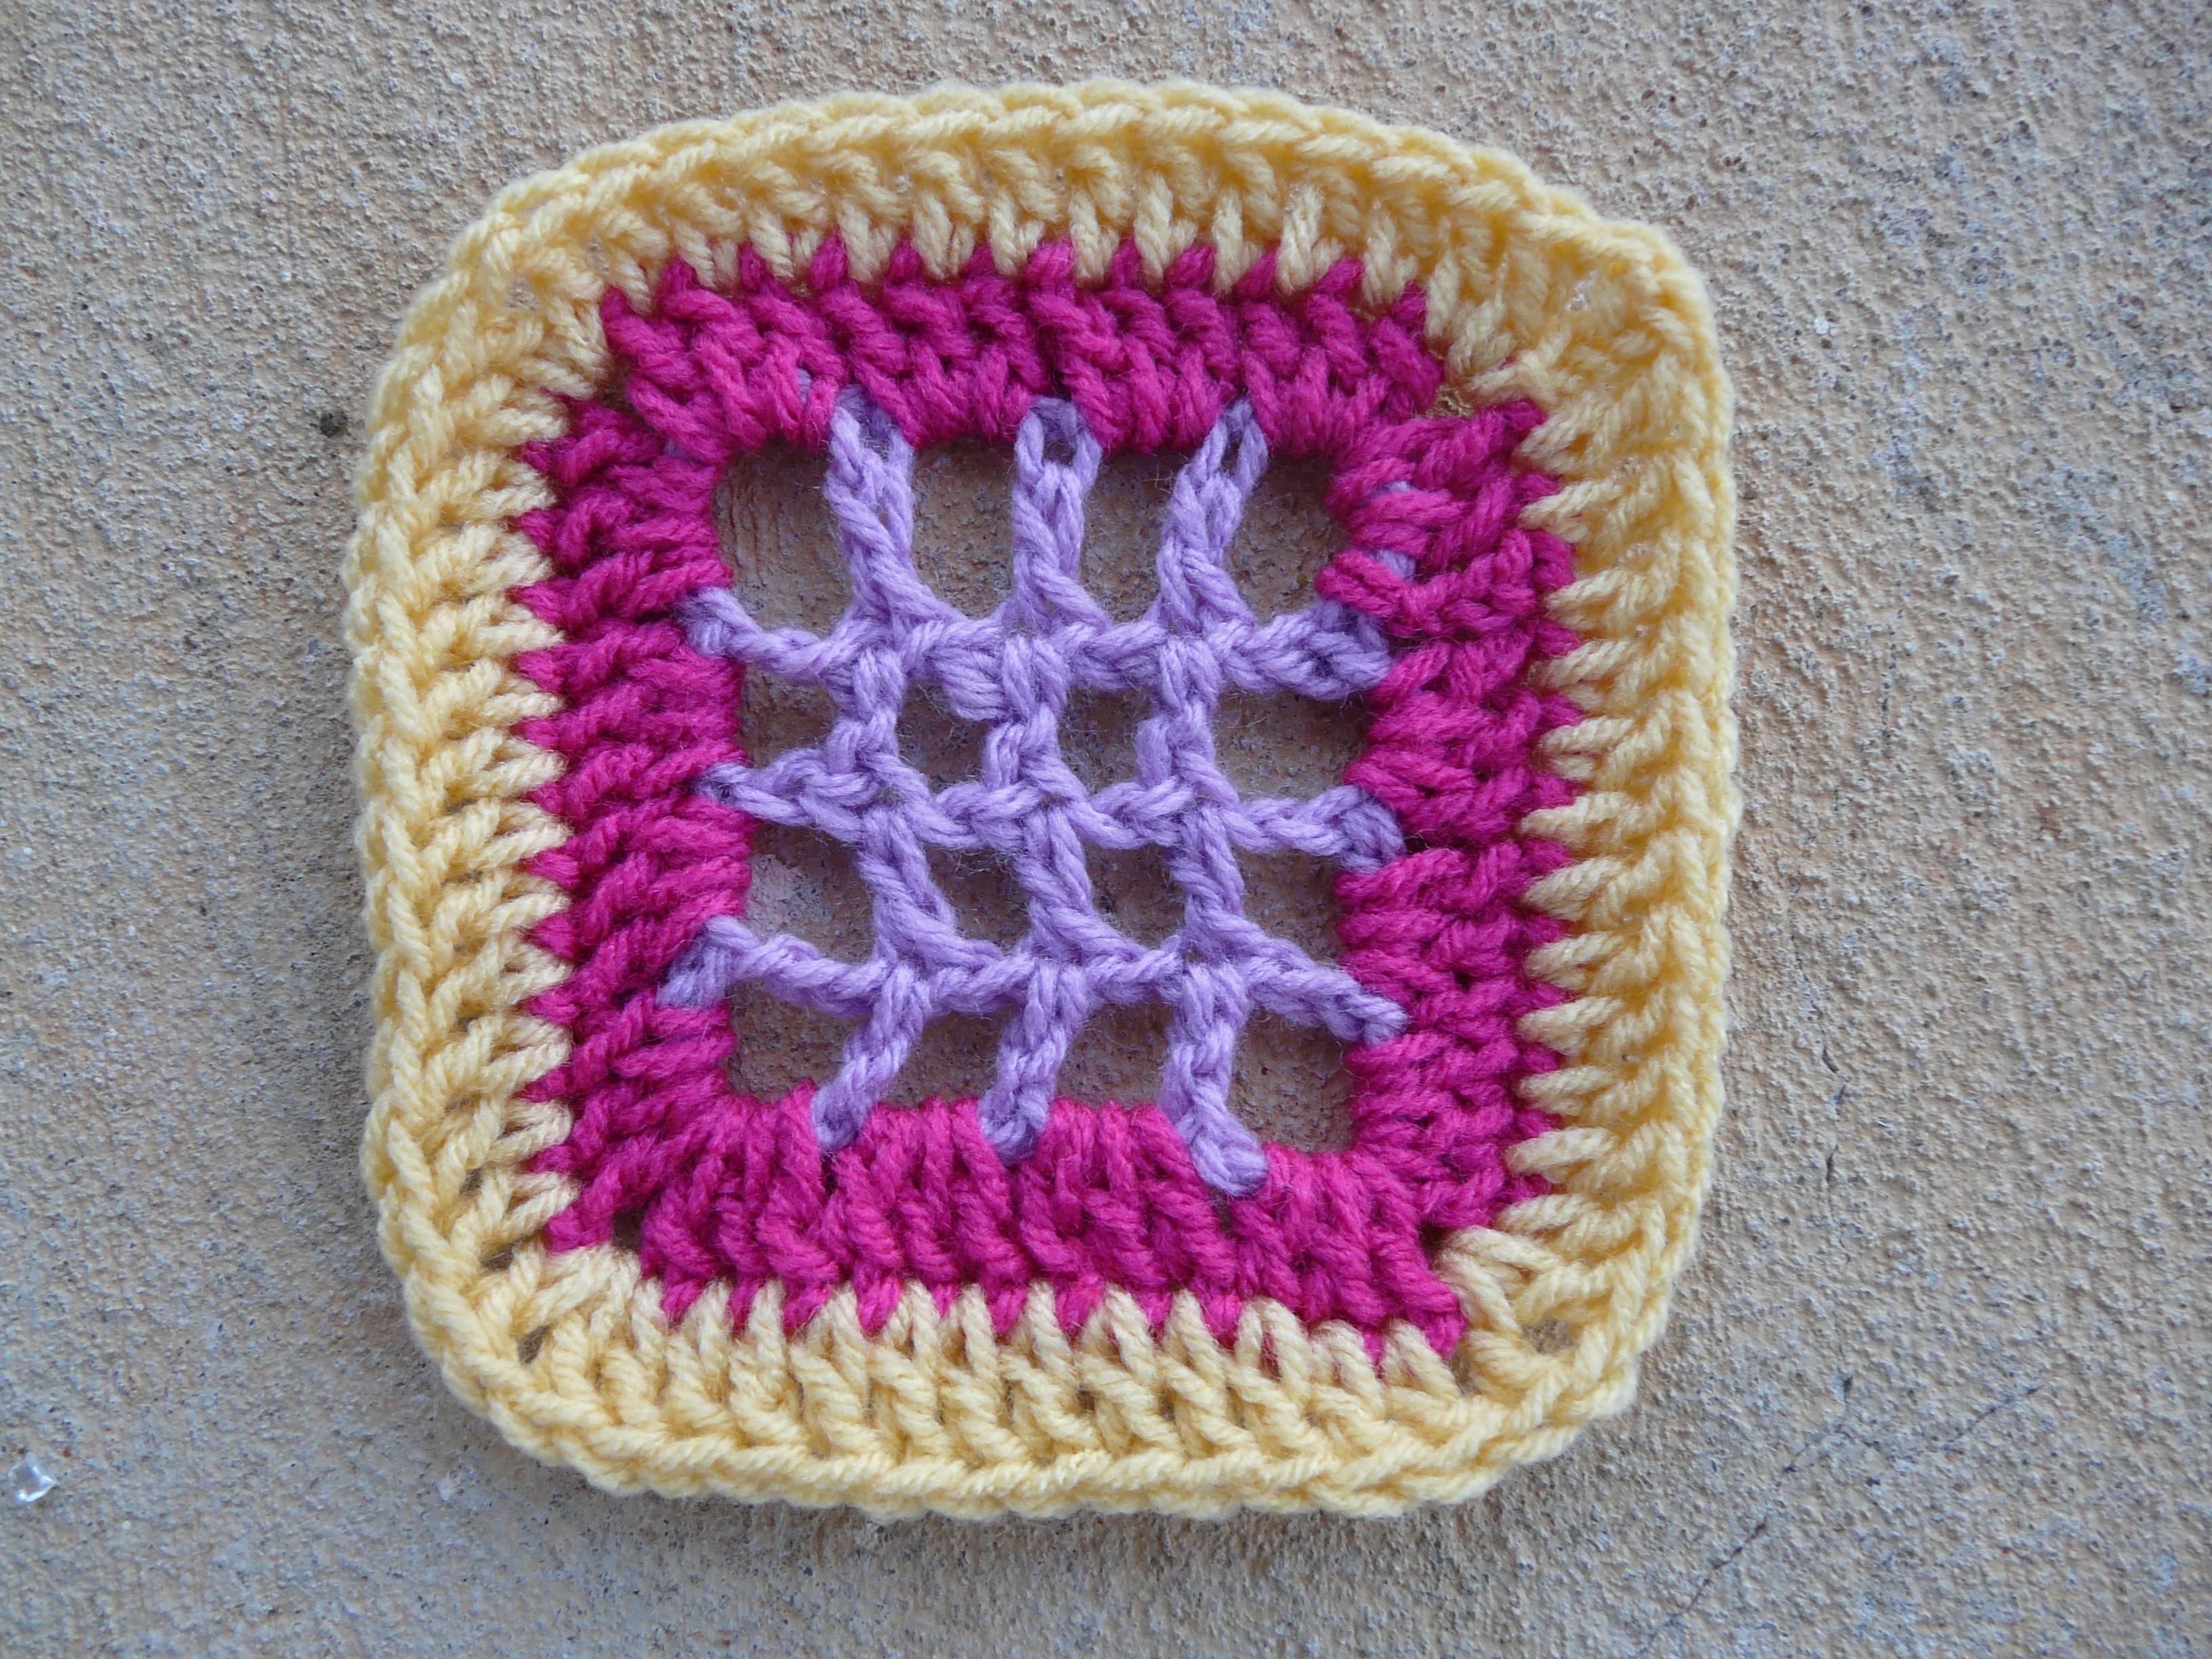 101 Crochet Stitches Jean Leinhauser : crochet jean 101 crochet crochet patterns jean leinhauser s gettin ...